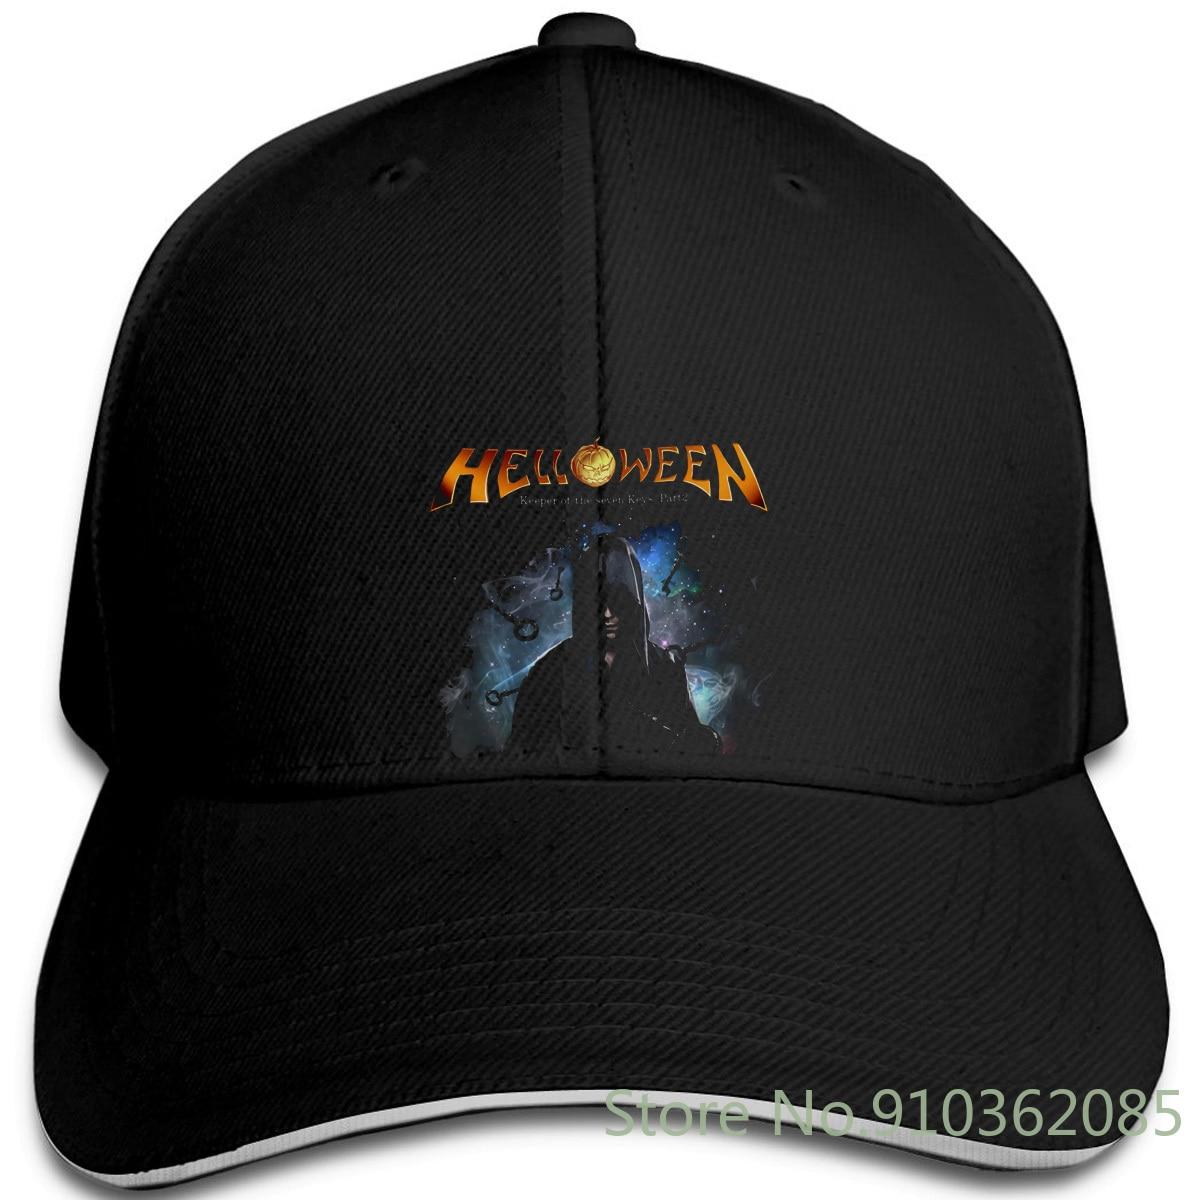 Helloween Keeper of The Seven Keys Black Metal Band Fan pre-ajustable gorras béisbol gorra hombres mujeres